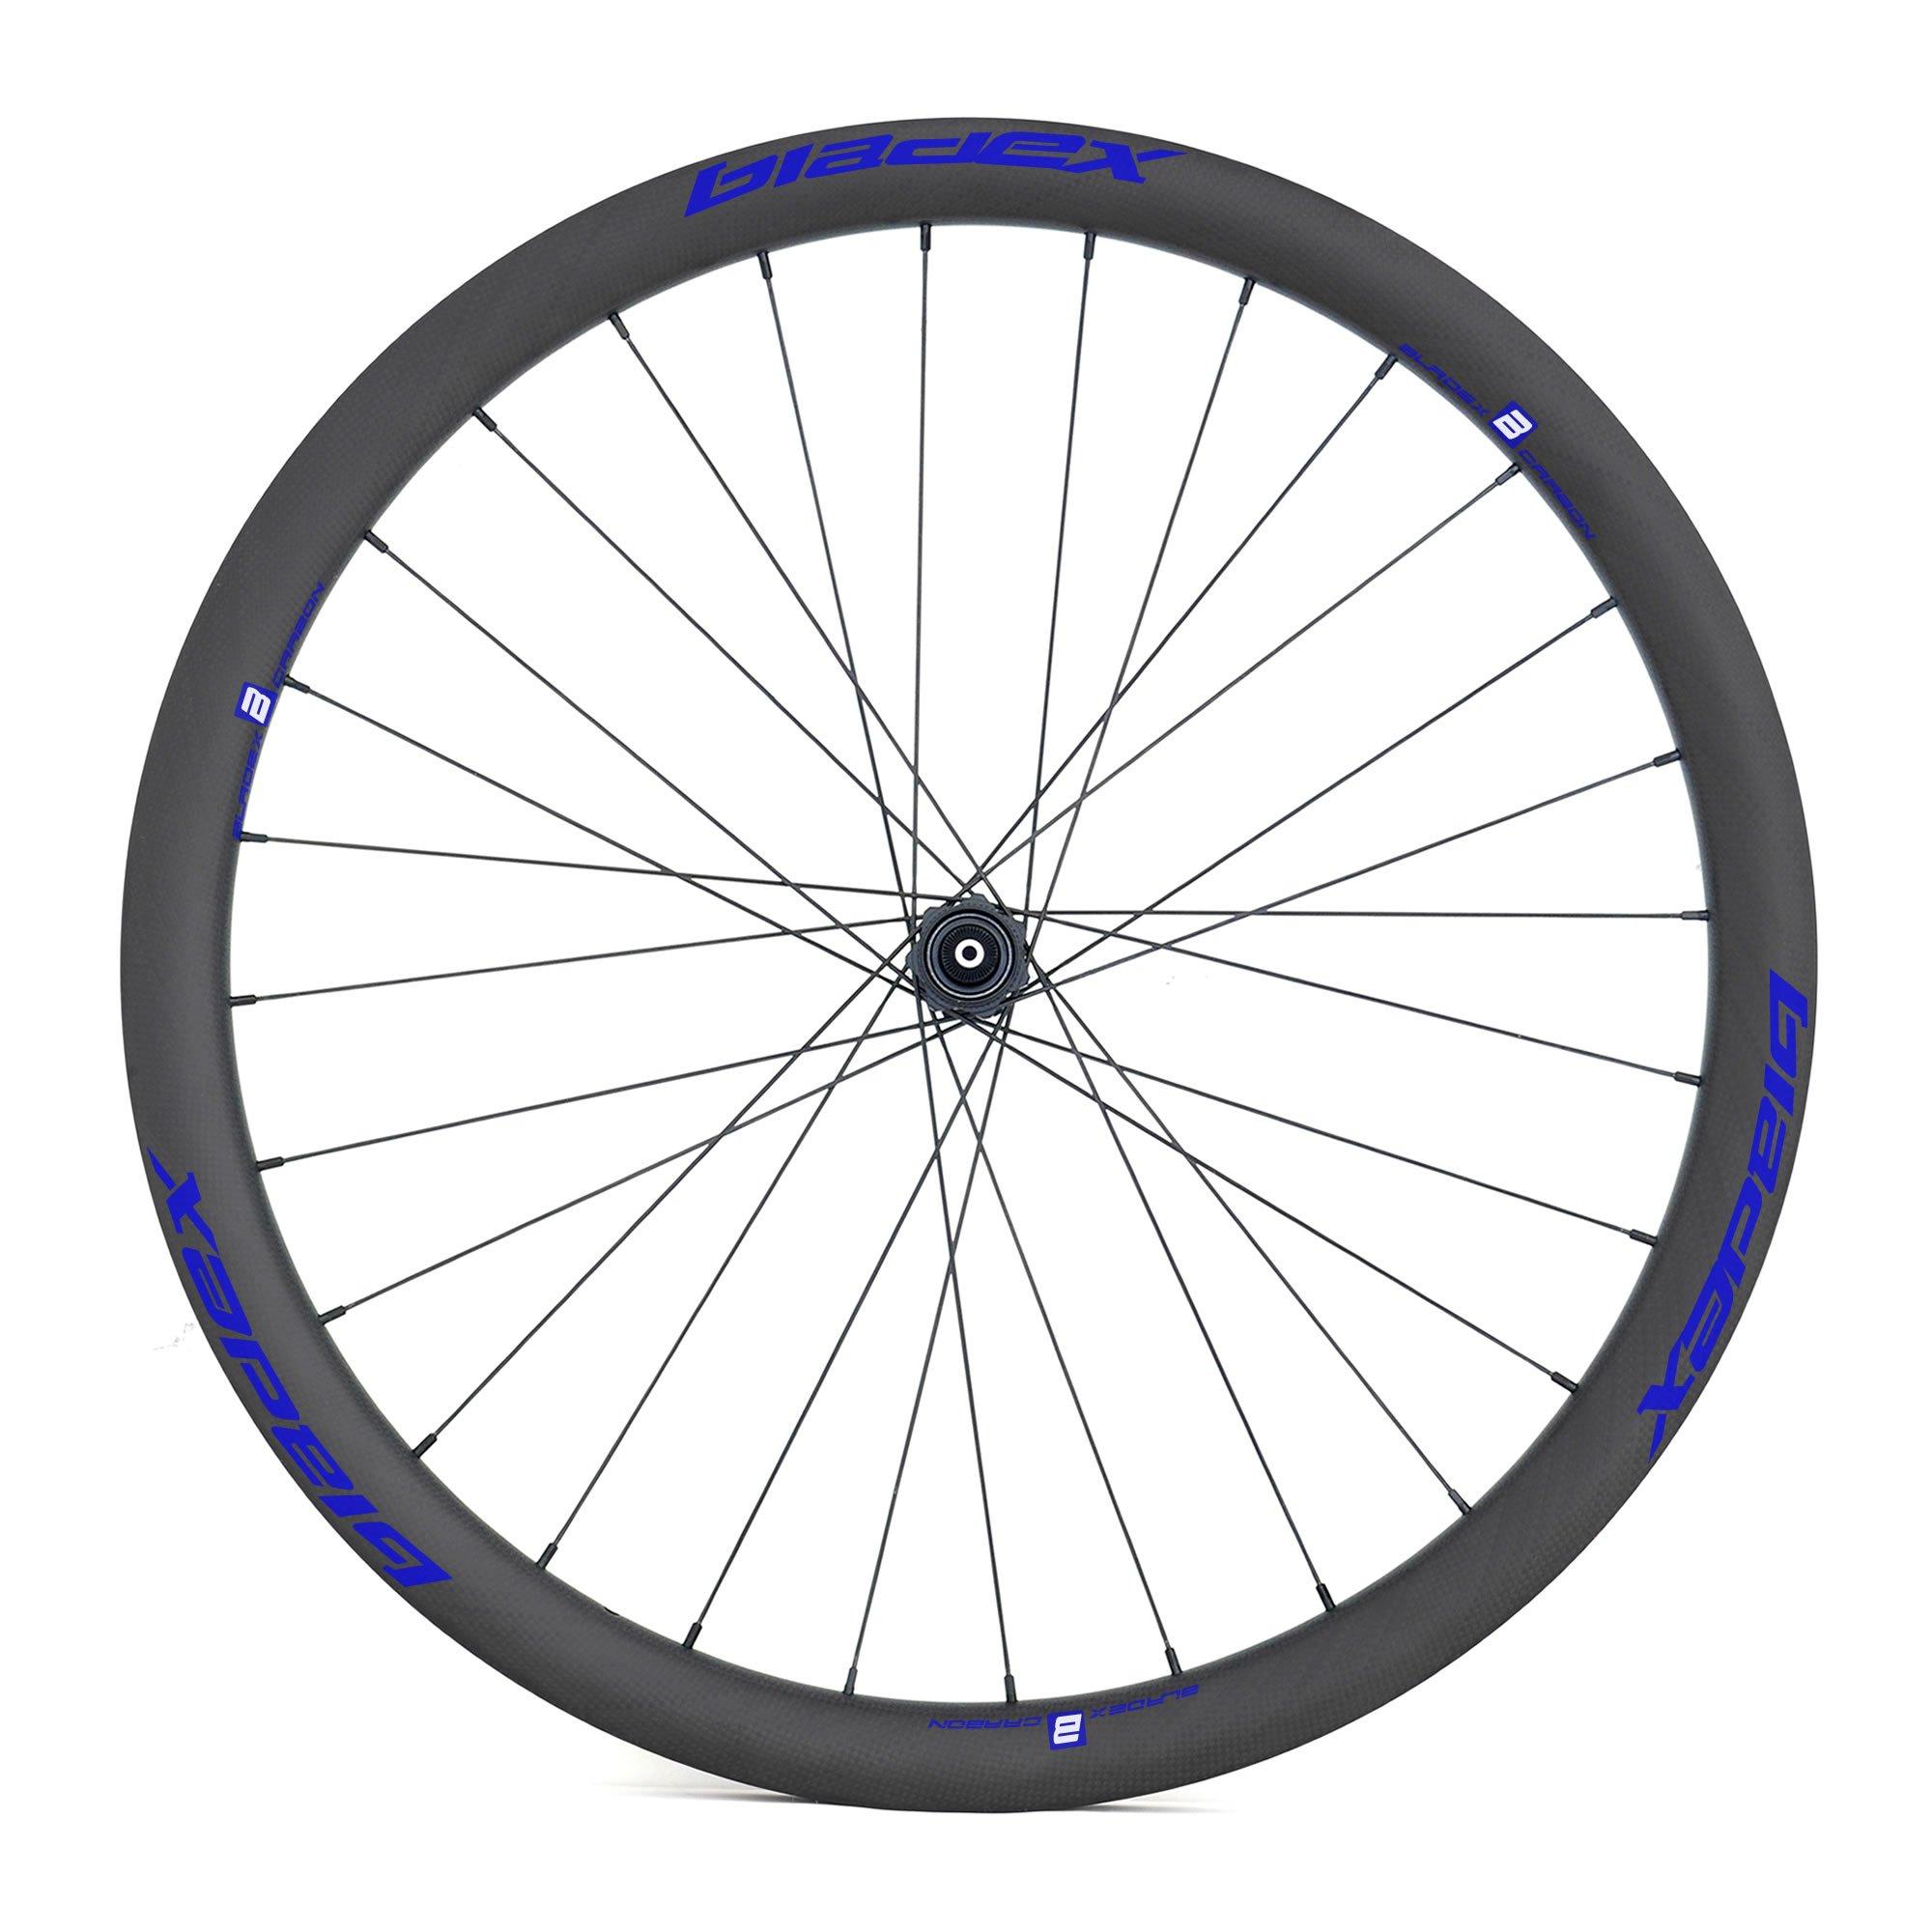 BladeX ULTIAMTE ROAD DB38 Disc Brake Road Bike Wheelset Front With Blue Logo